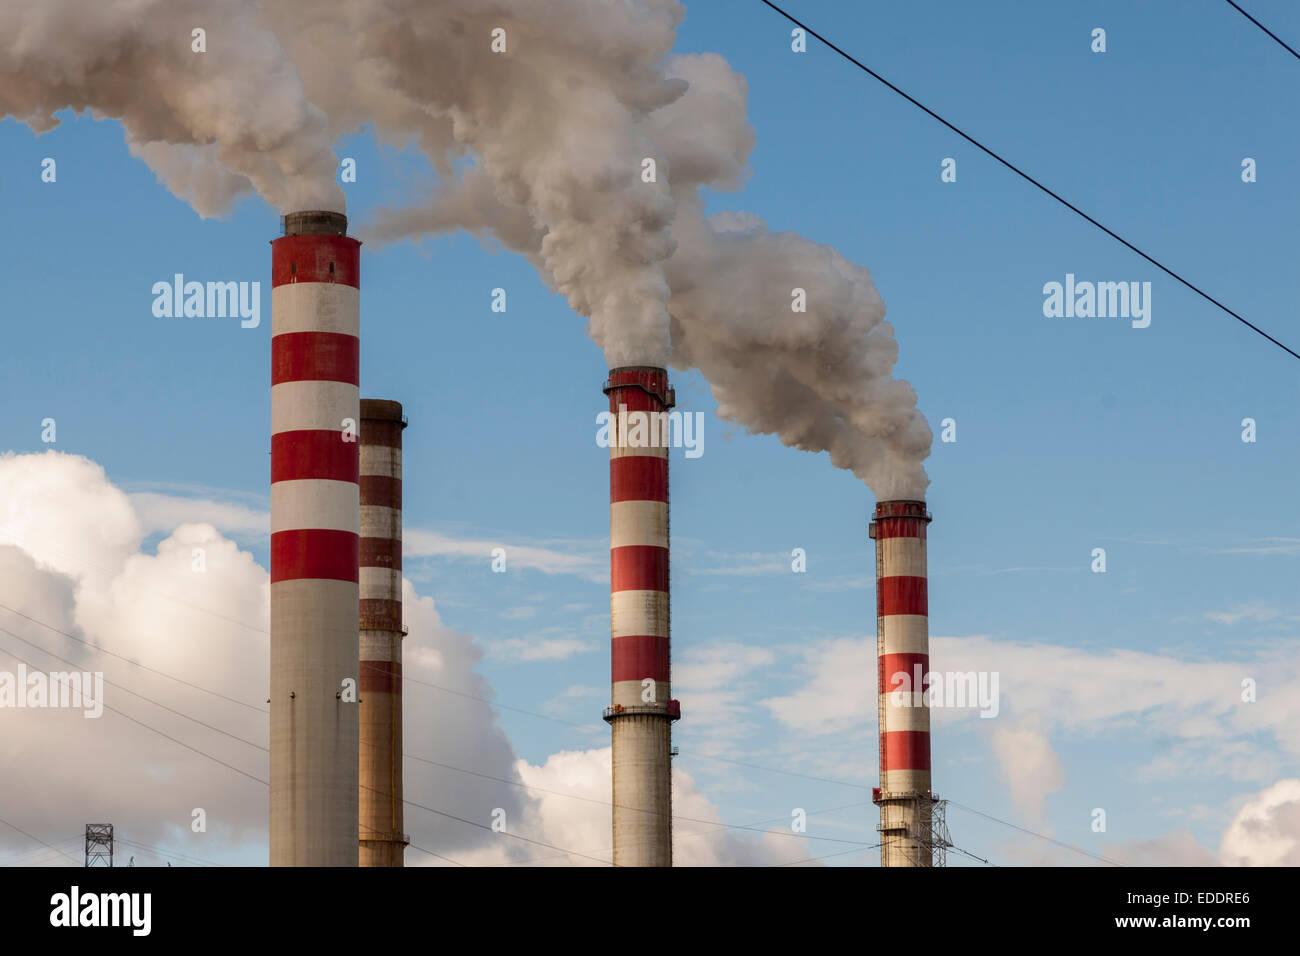 Big pollution in Polish Coal Power Plant - Patnow, Konin, Europe. - Stock Image